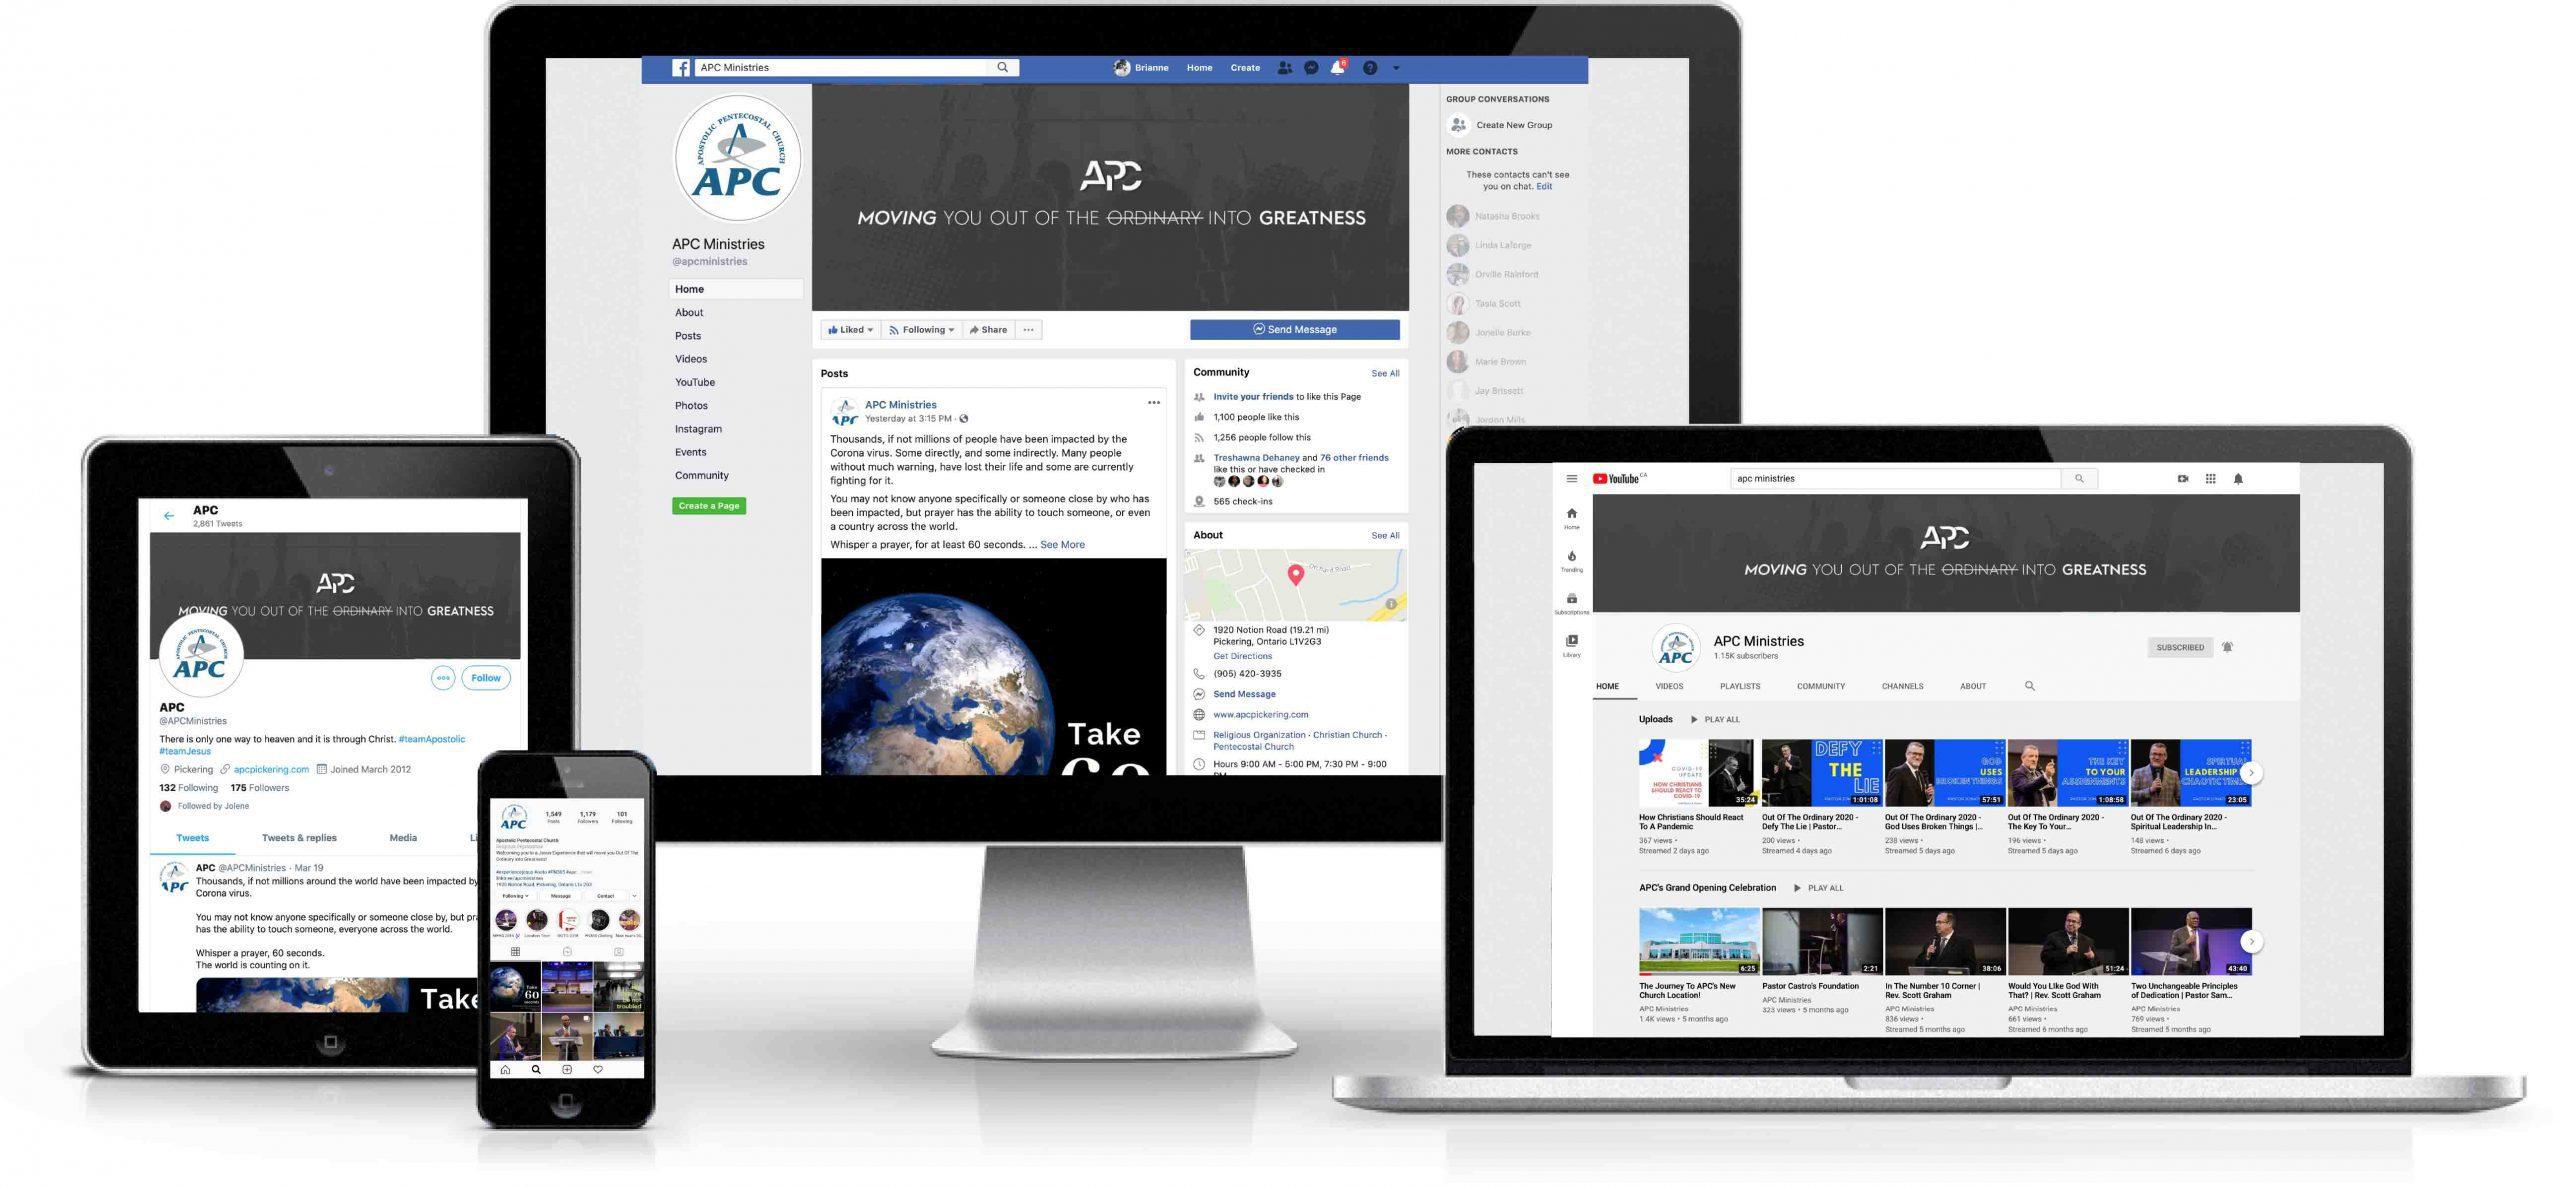 APC Social Media Platforms on Devices